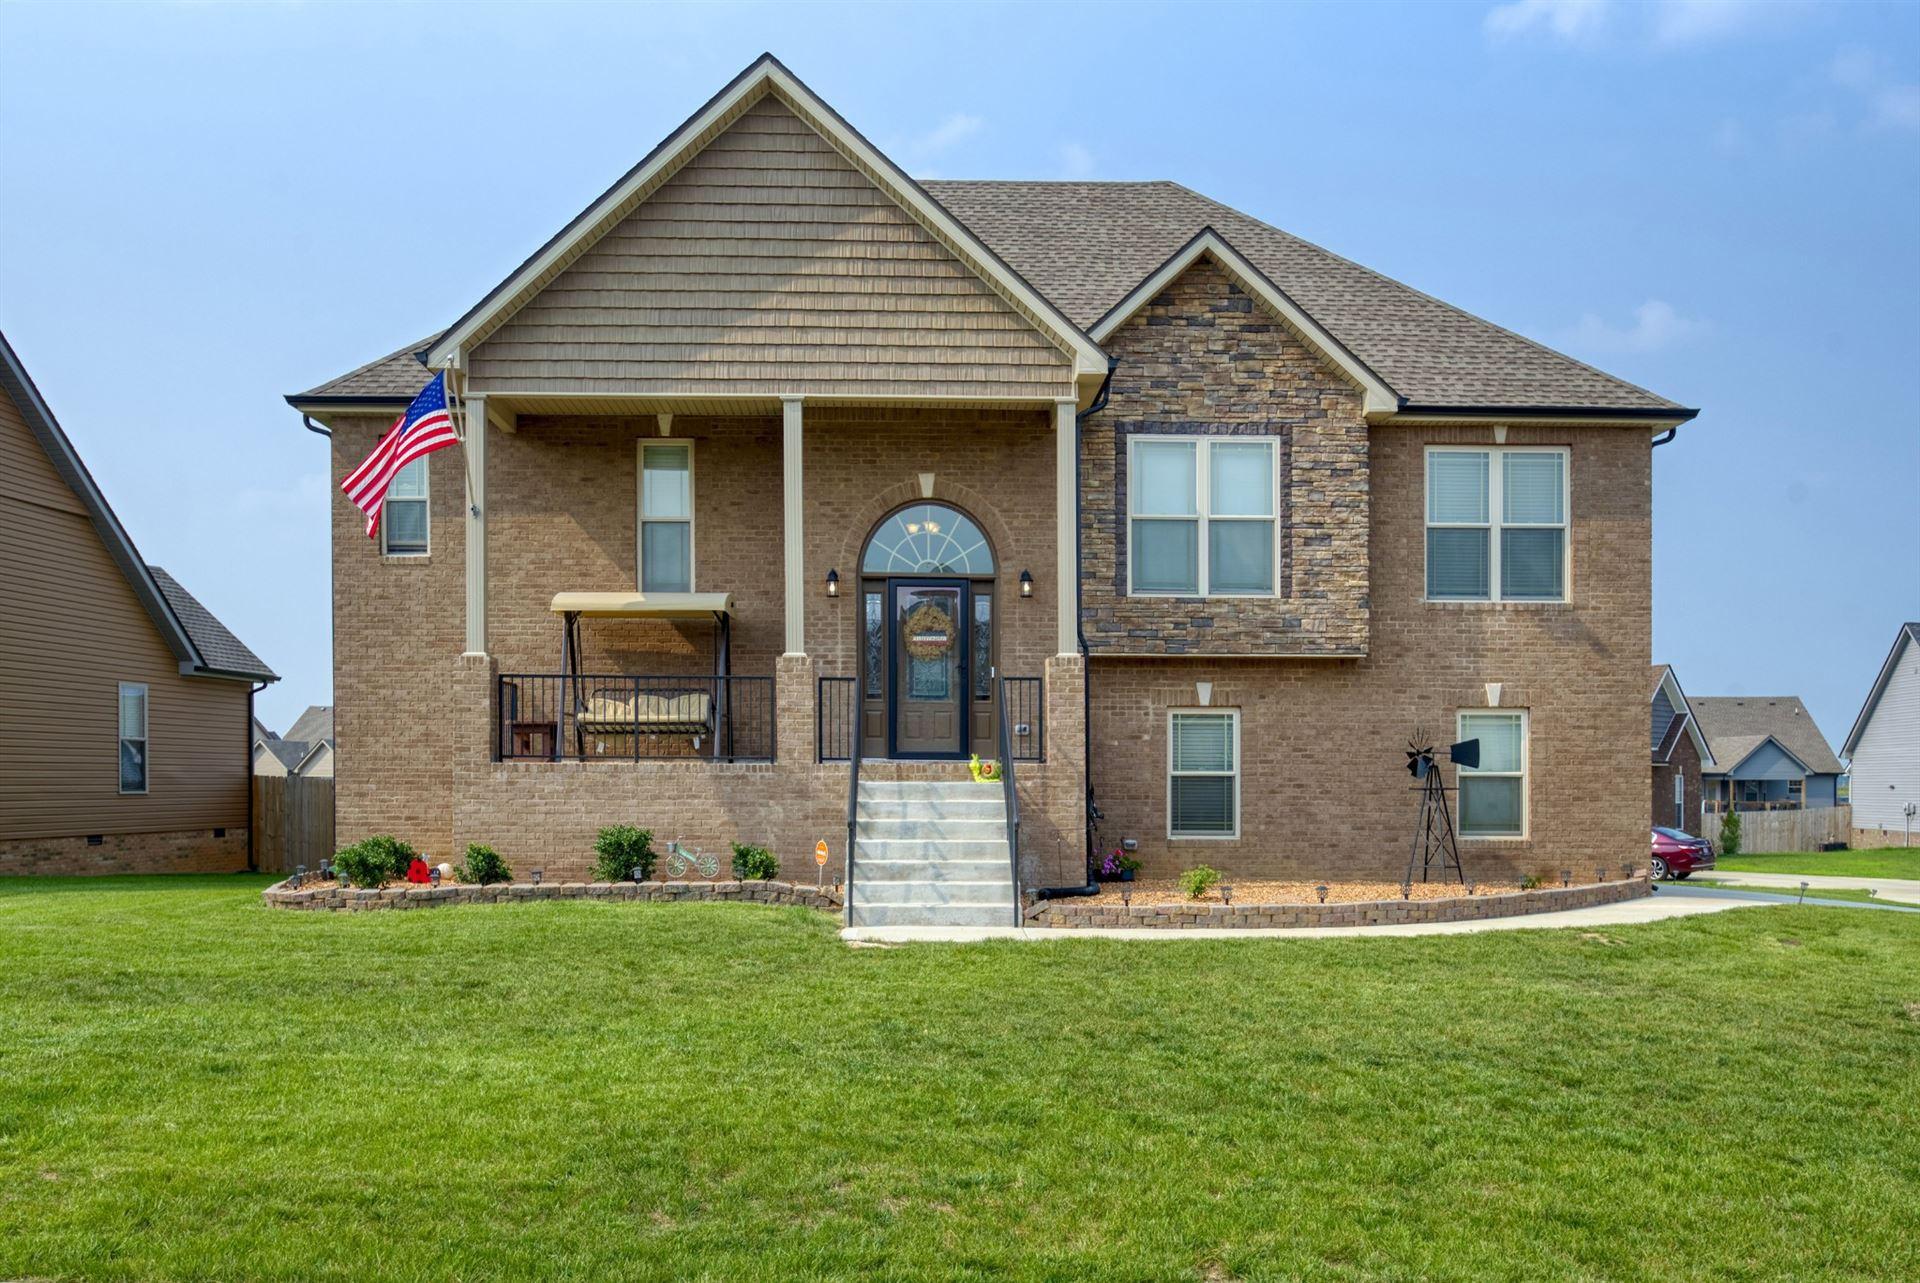 713 Rushville Dr, Clarksville, TN 37042 - MLS#: 2273154